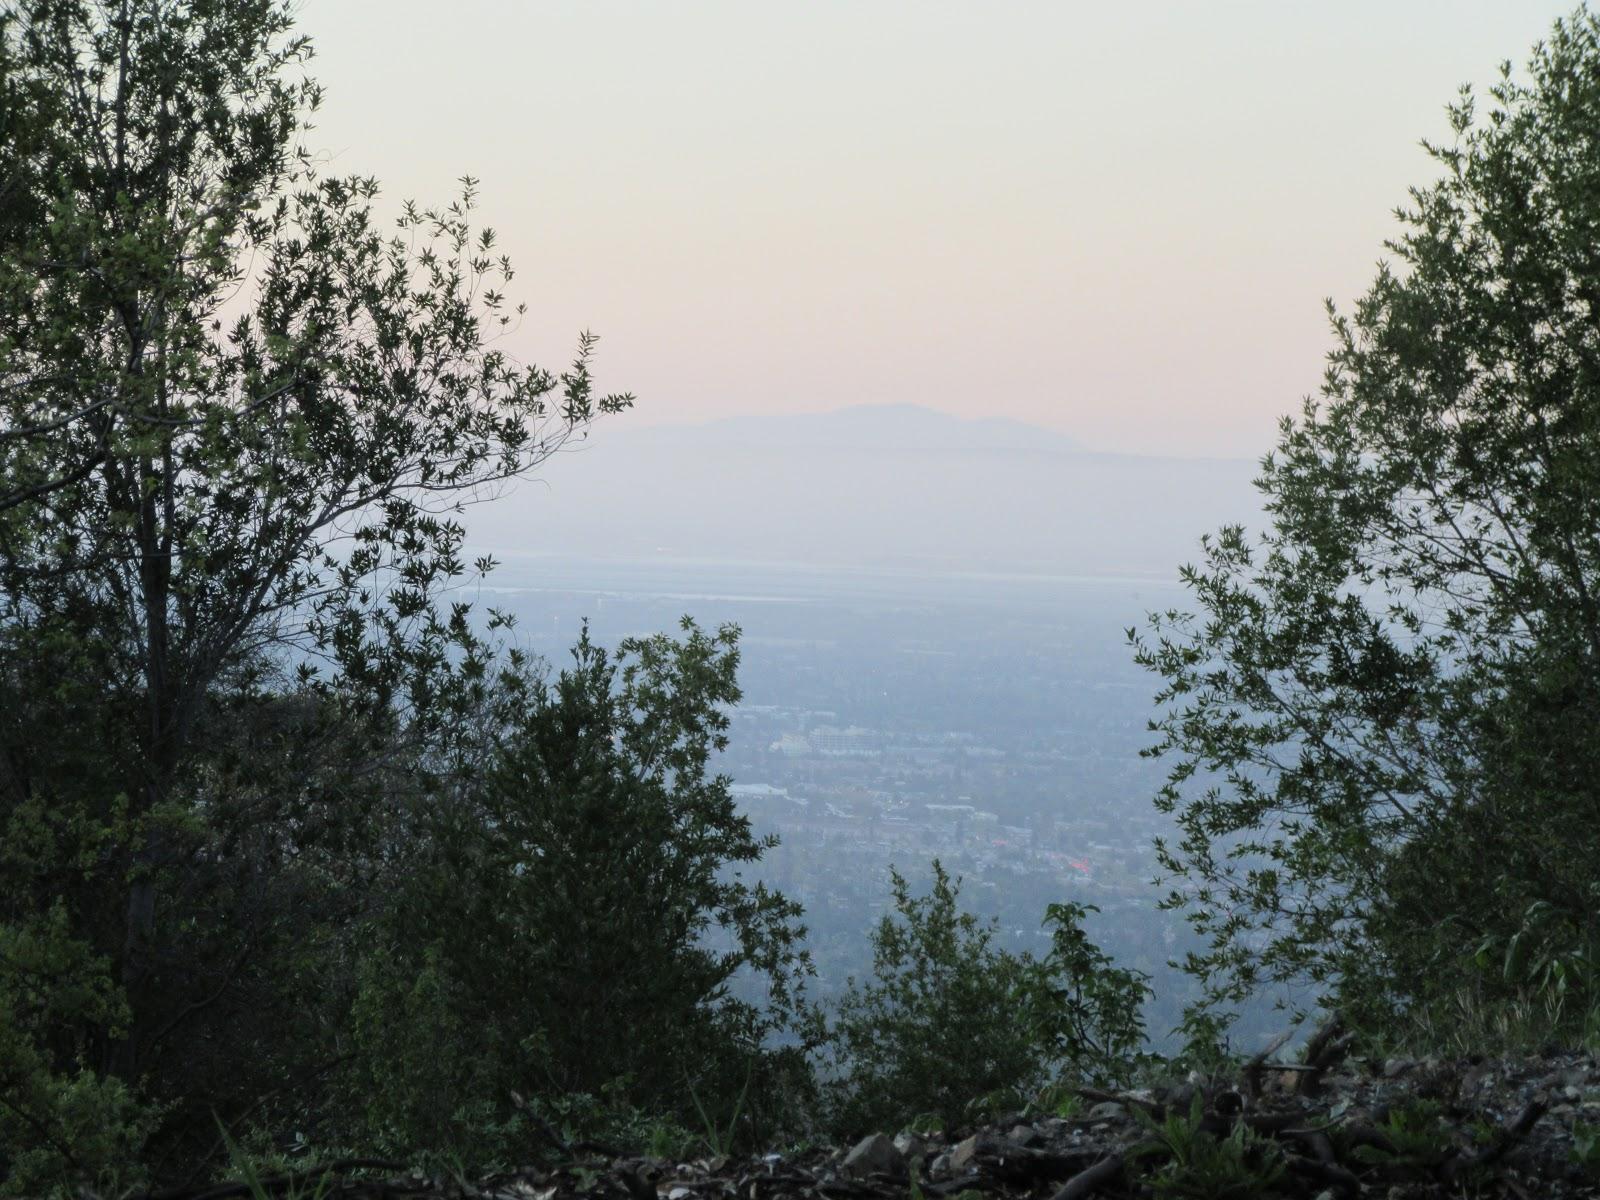 Climbing Bohlman Road by bike - view of Santa Clara Valley through trees